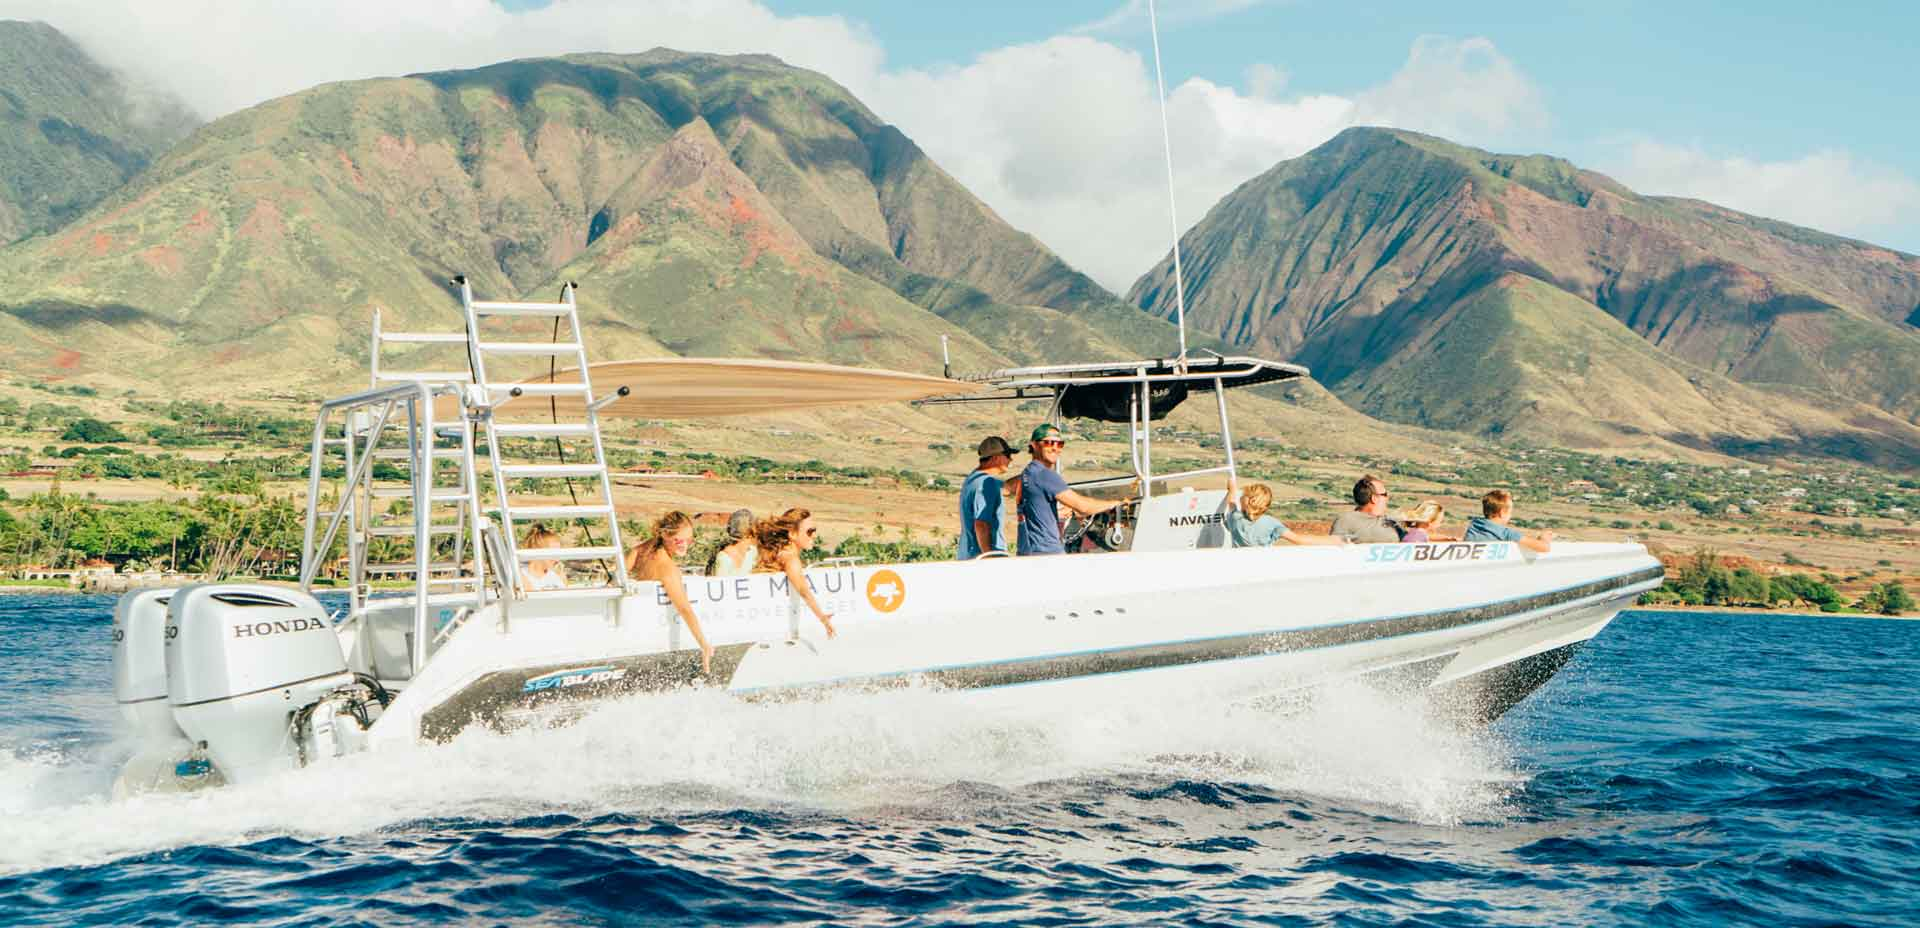 Ocean Raft Snorkel Trip Charter - Ka'anapali Beach